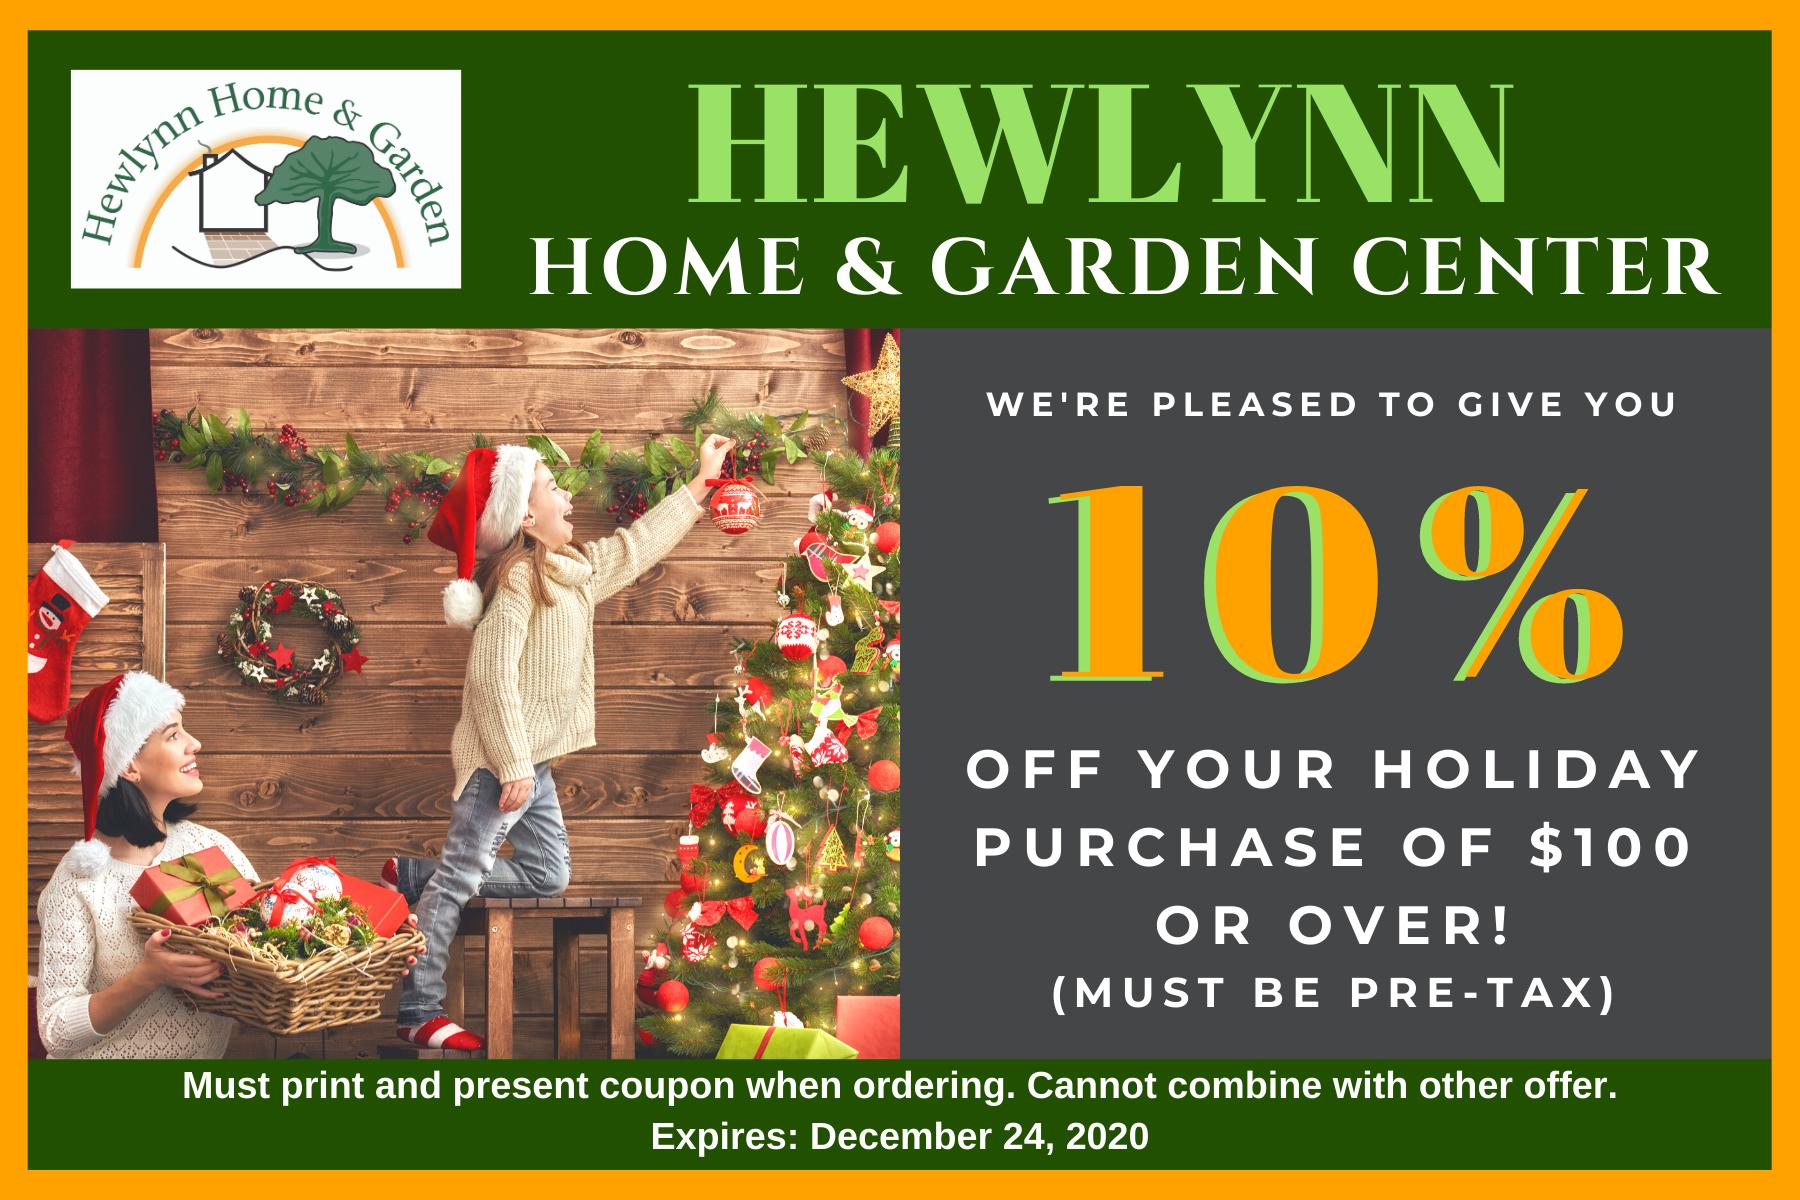 HEWLYNN HOME & GARDEN CENTER (2)